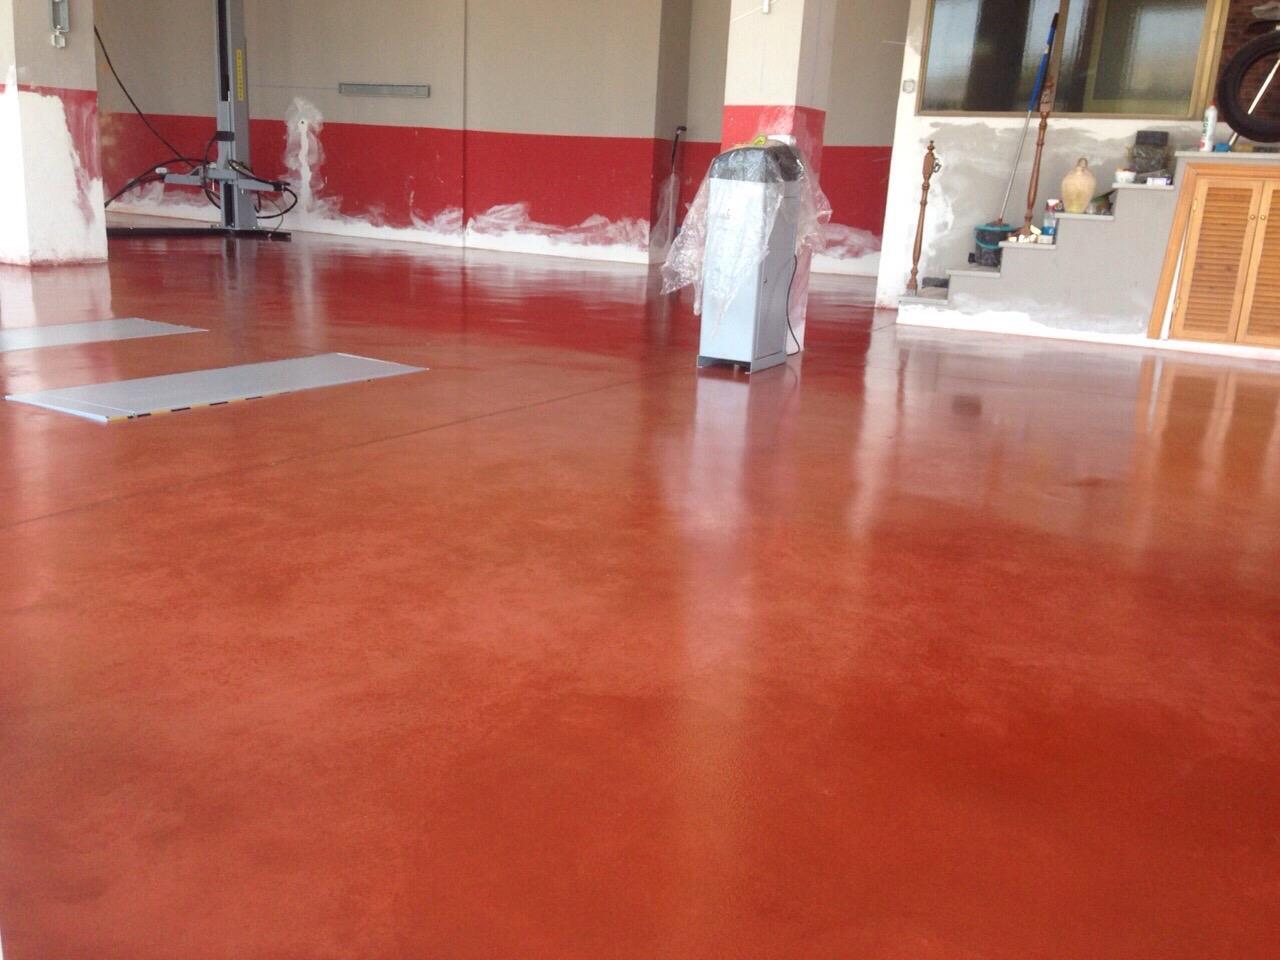 Pavimentos de hormigon fratasado pavimentos de hormigon pulido - Suelos cemento pulido precios ...